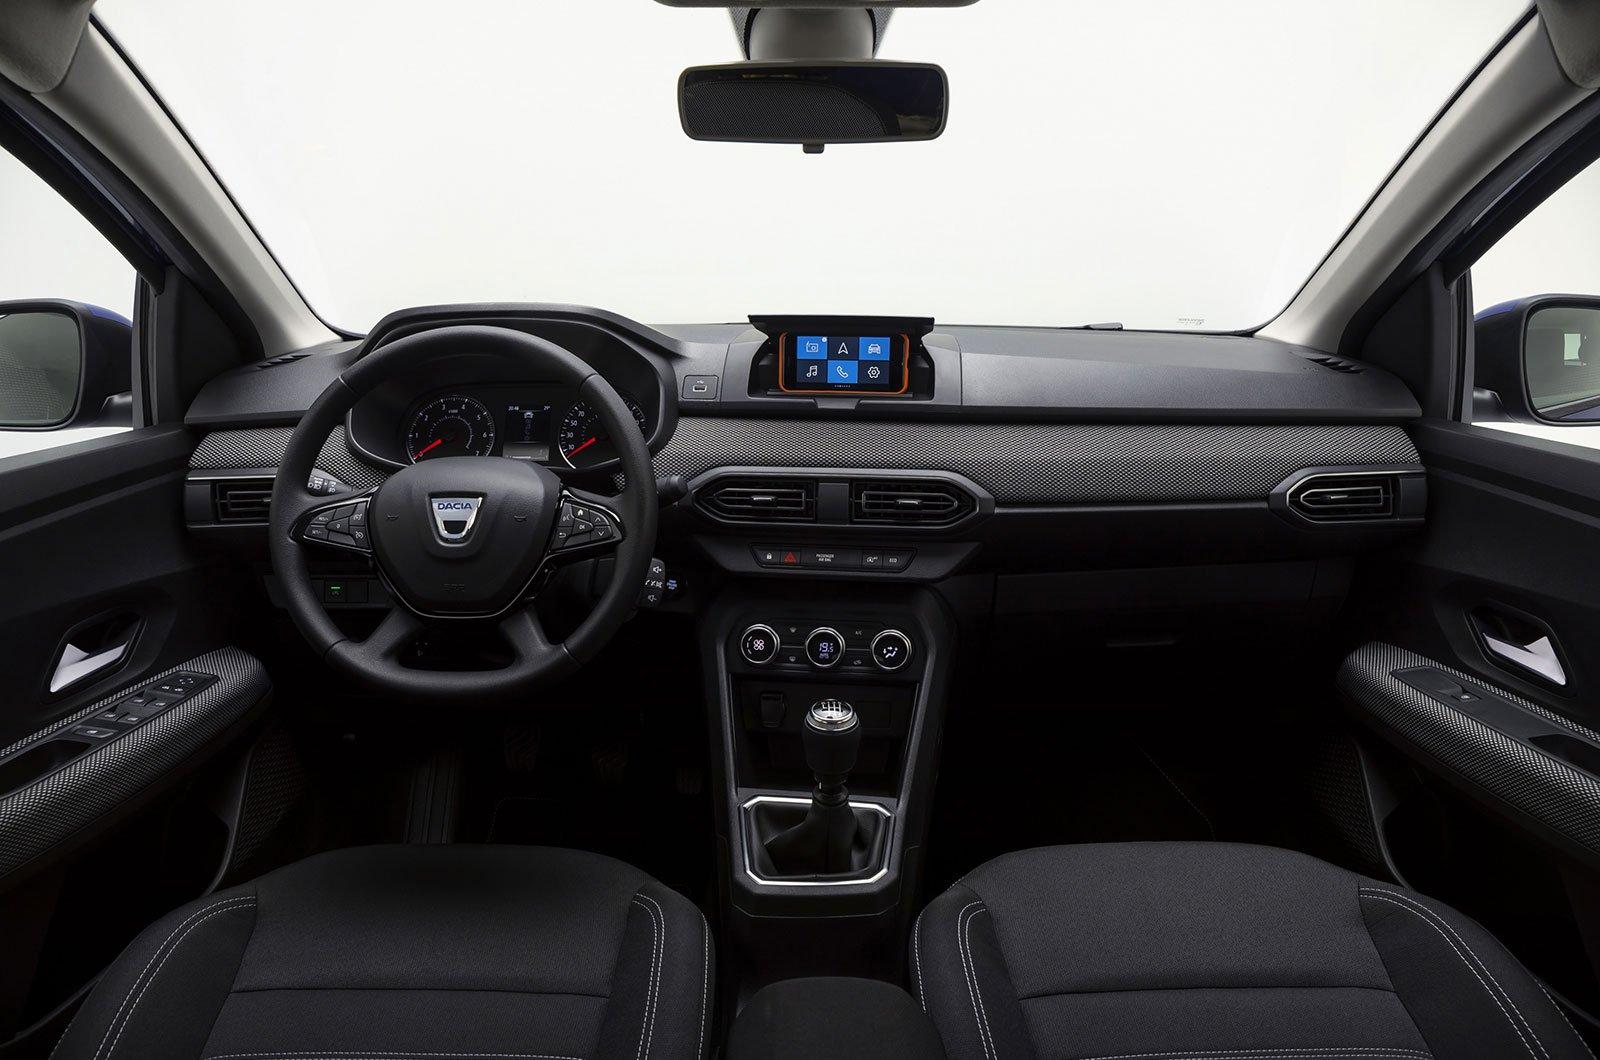 2021 Dacia Sandero interior